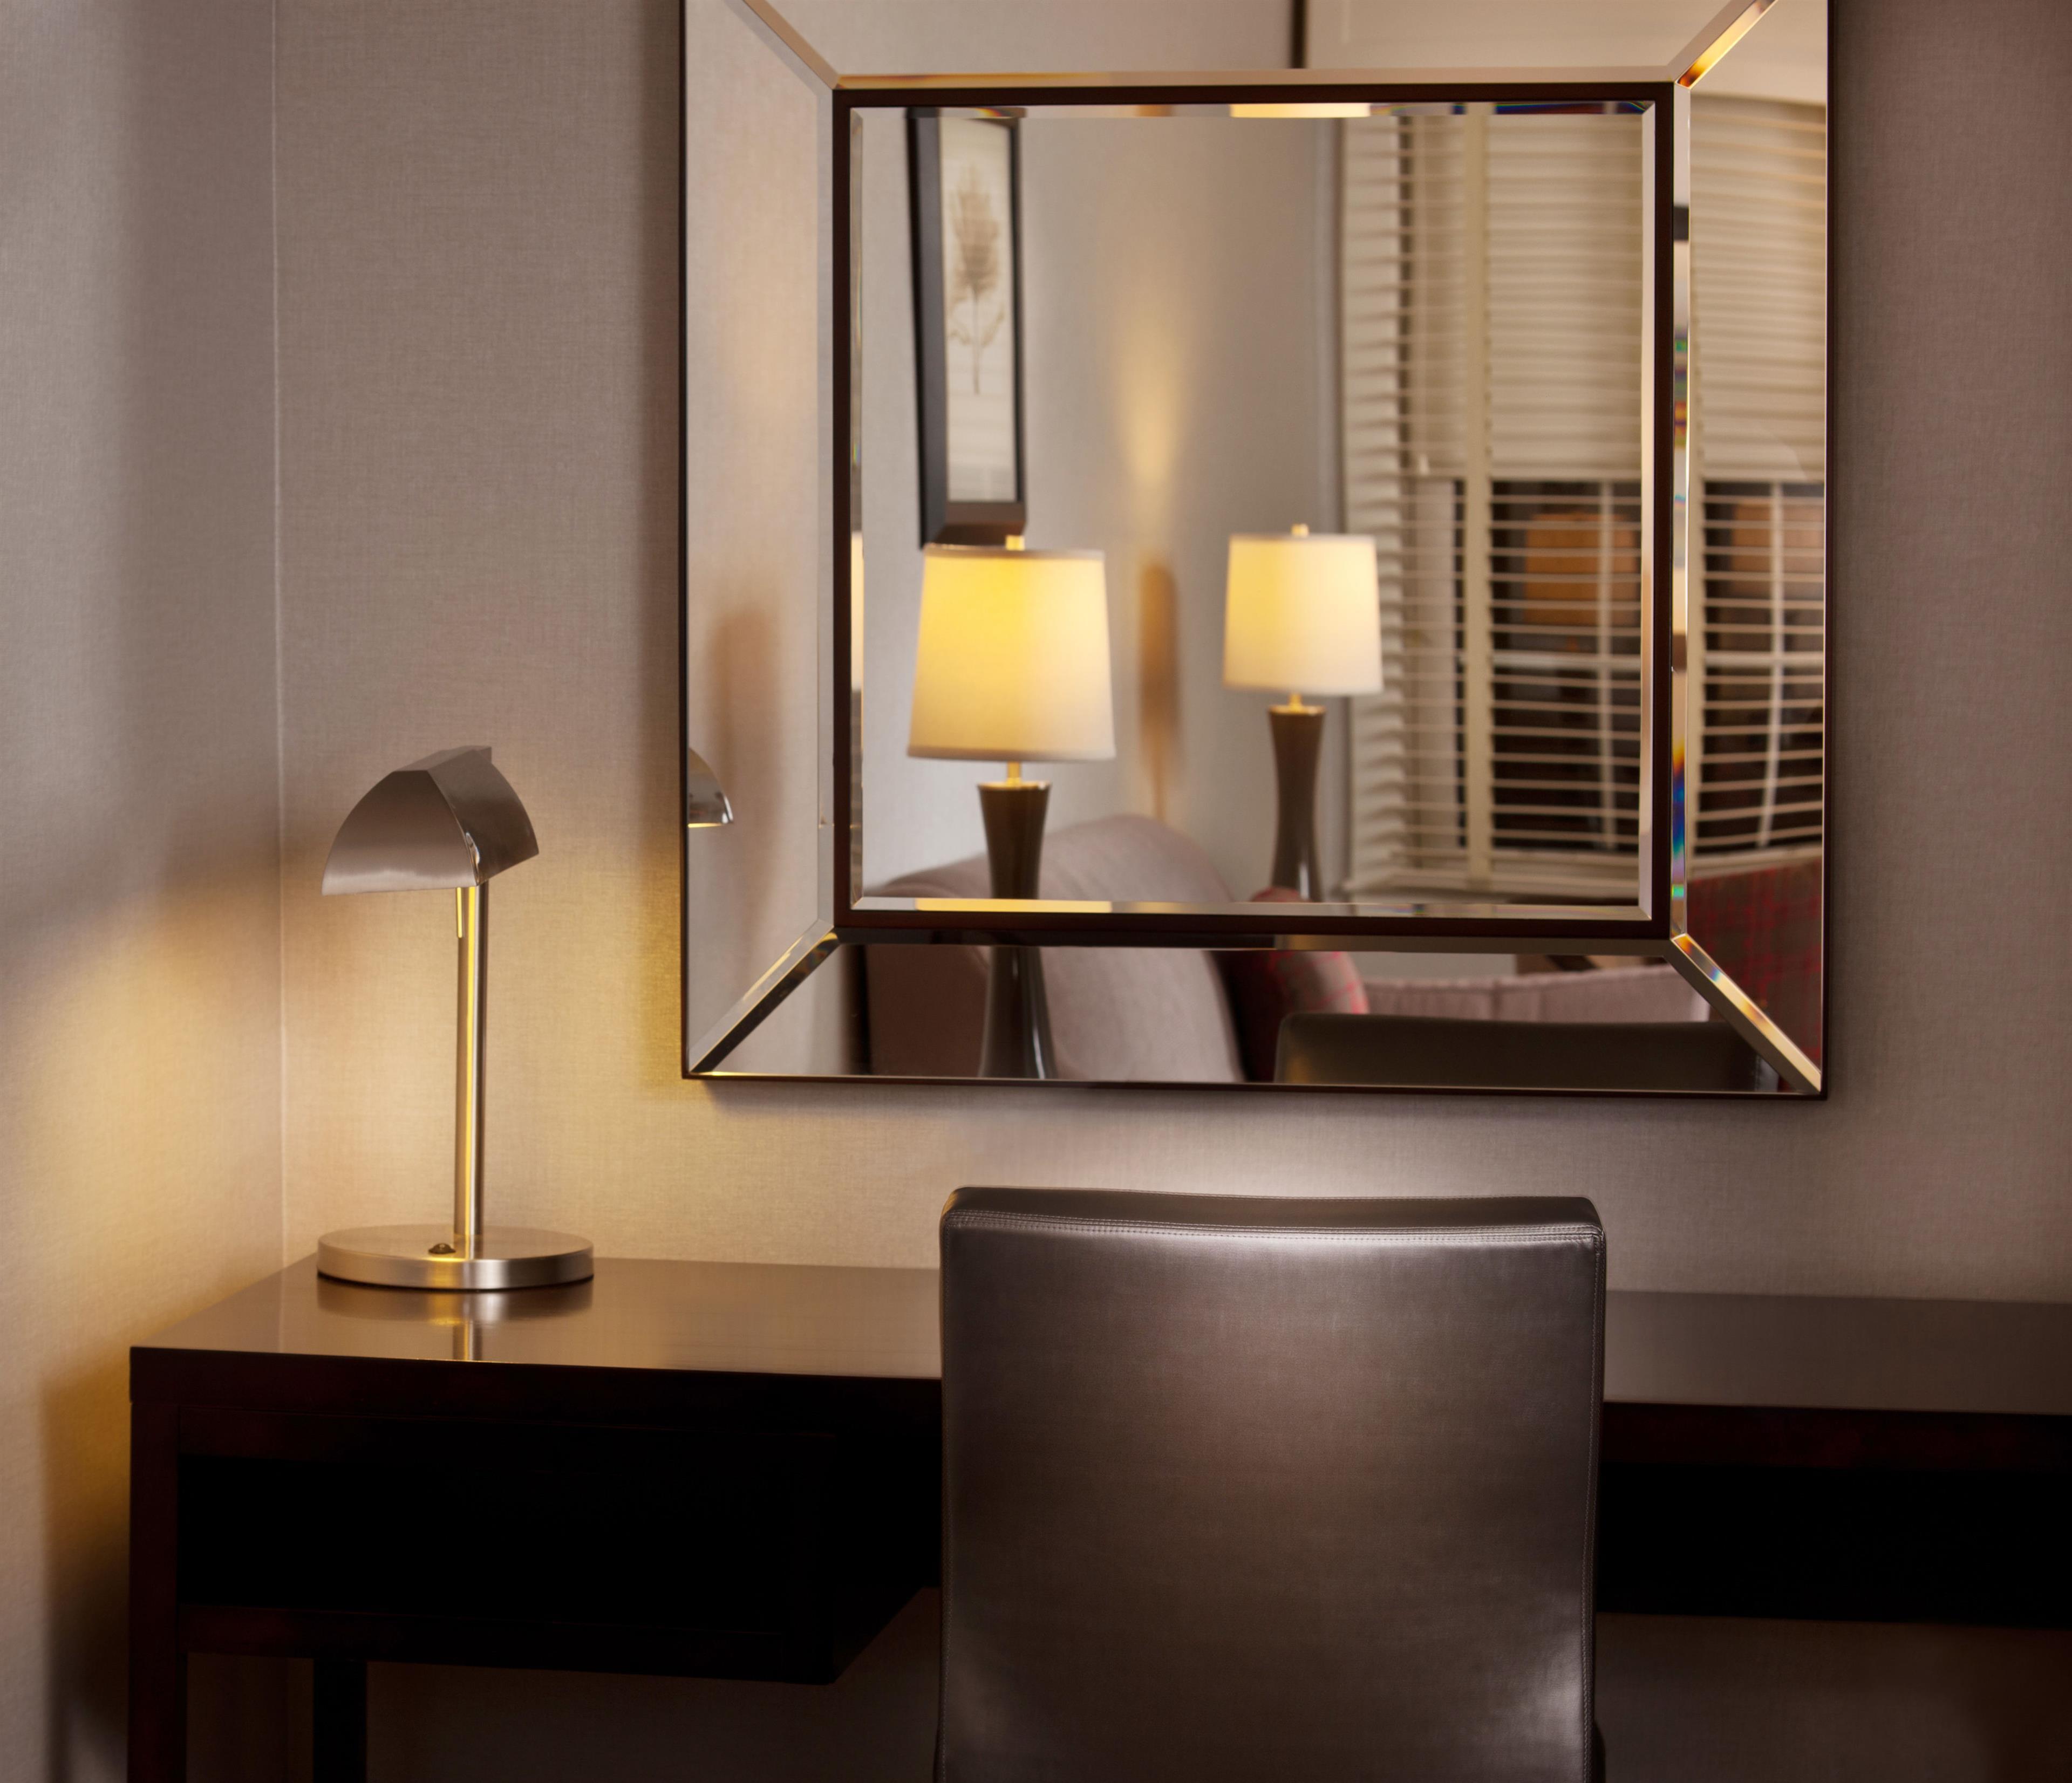 Westin Morristown Room Service